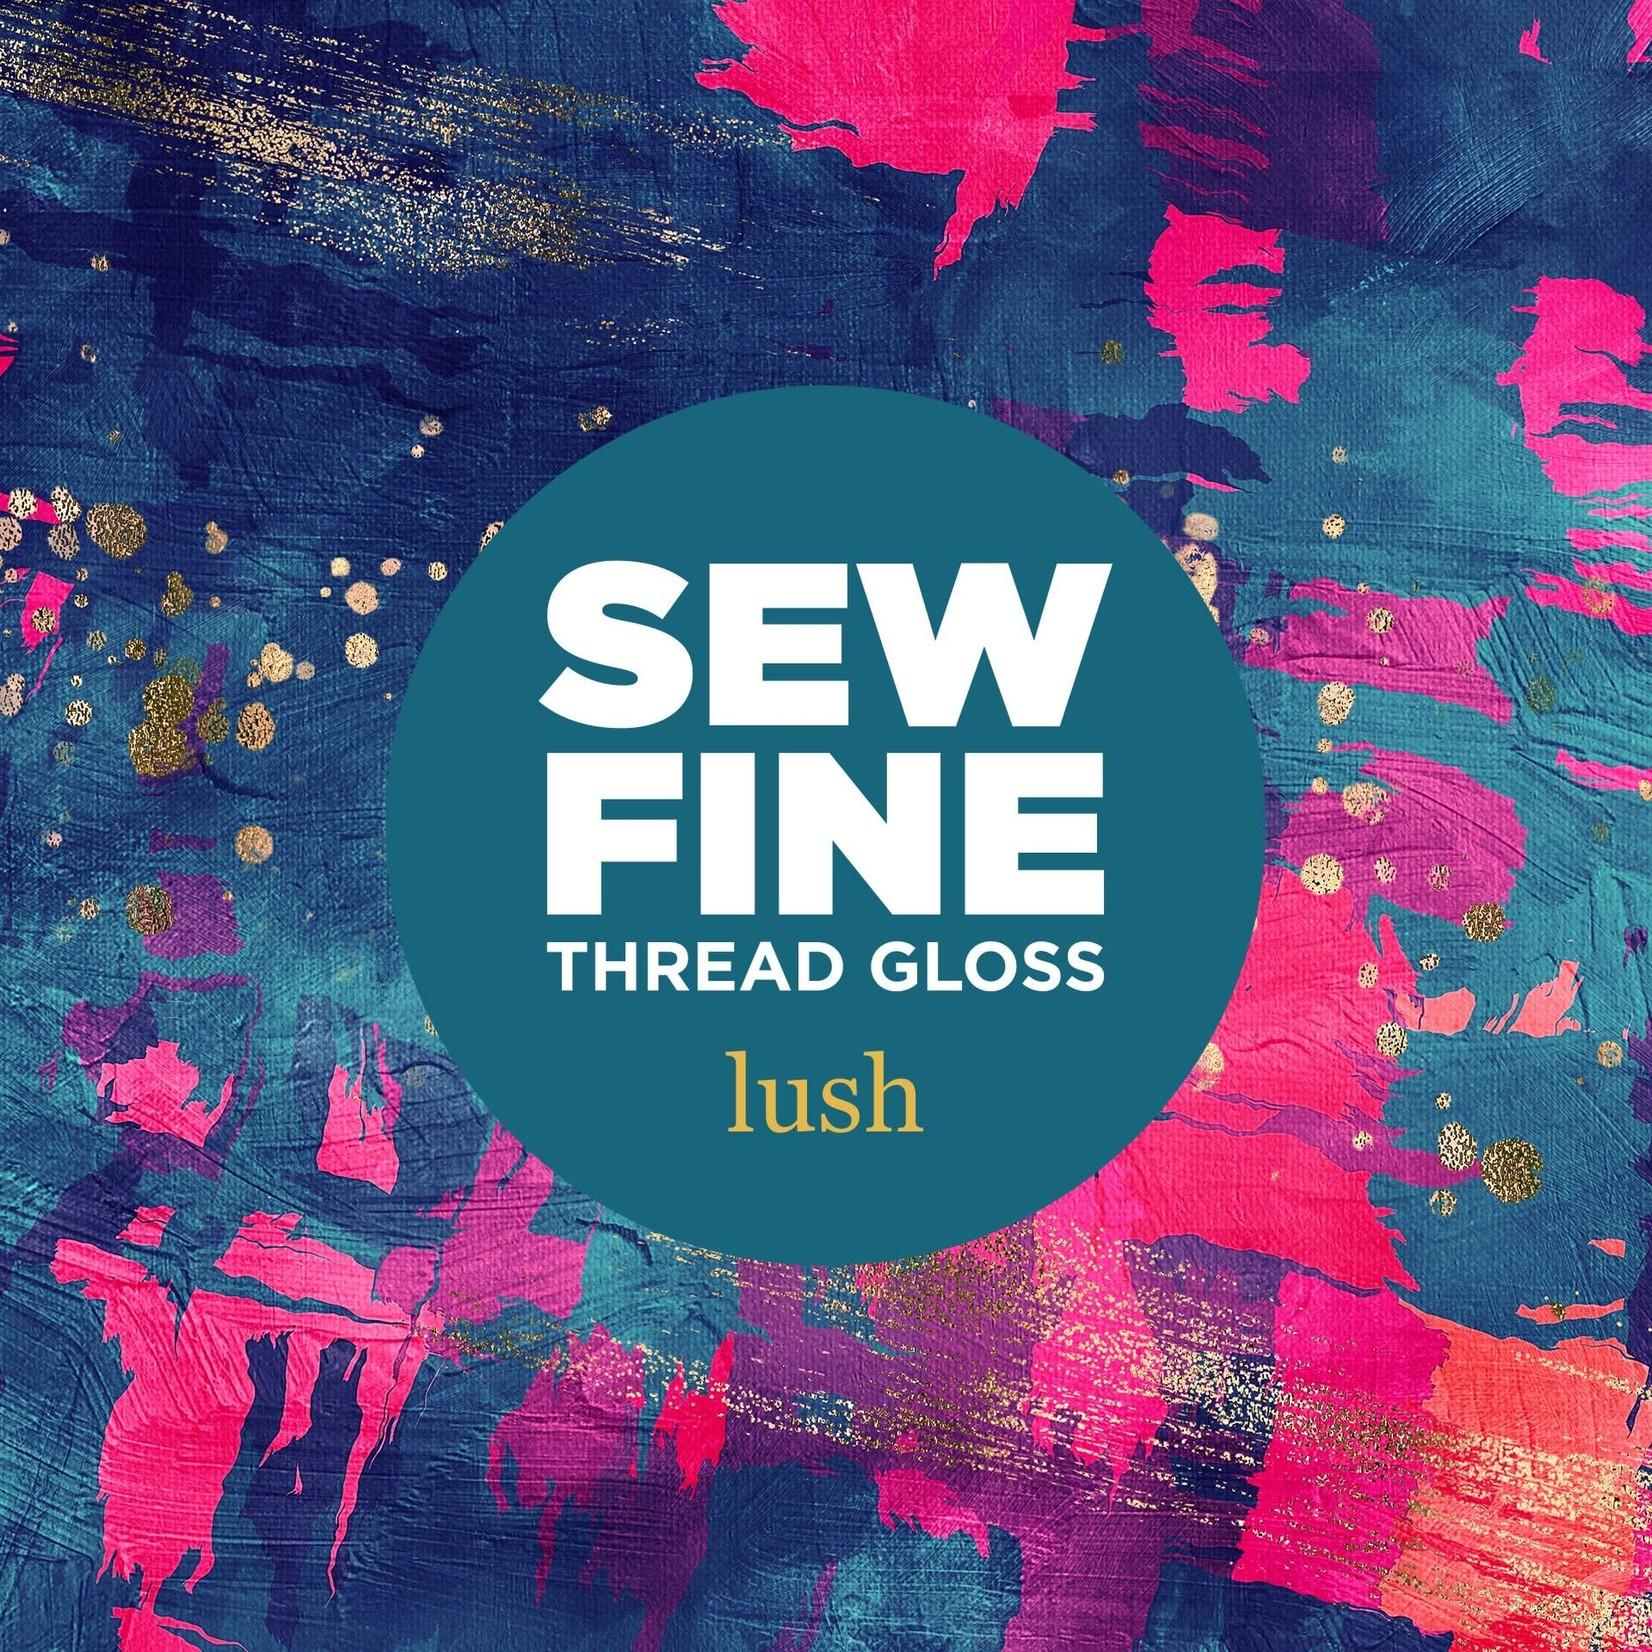 Sew Fine Sew Fine Thread Gloss: Lush 0.5 oz